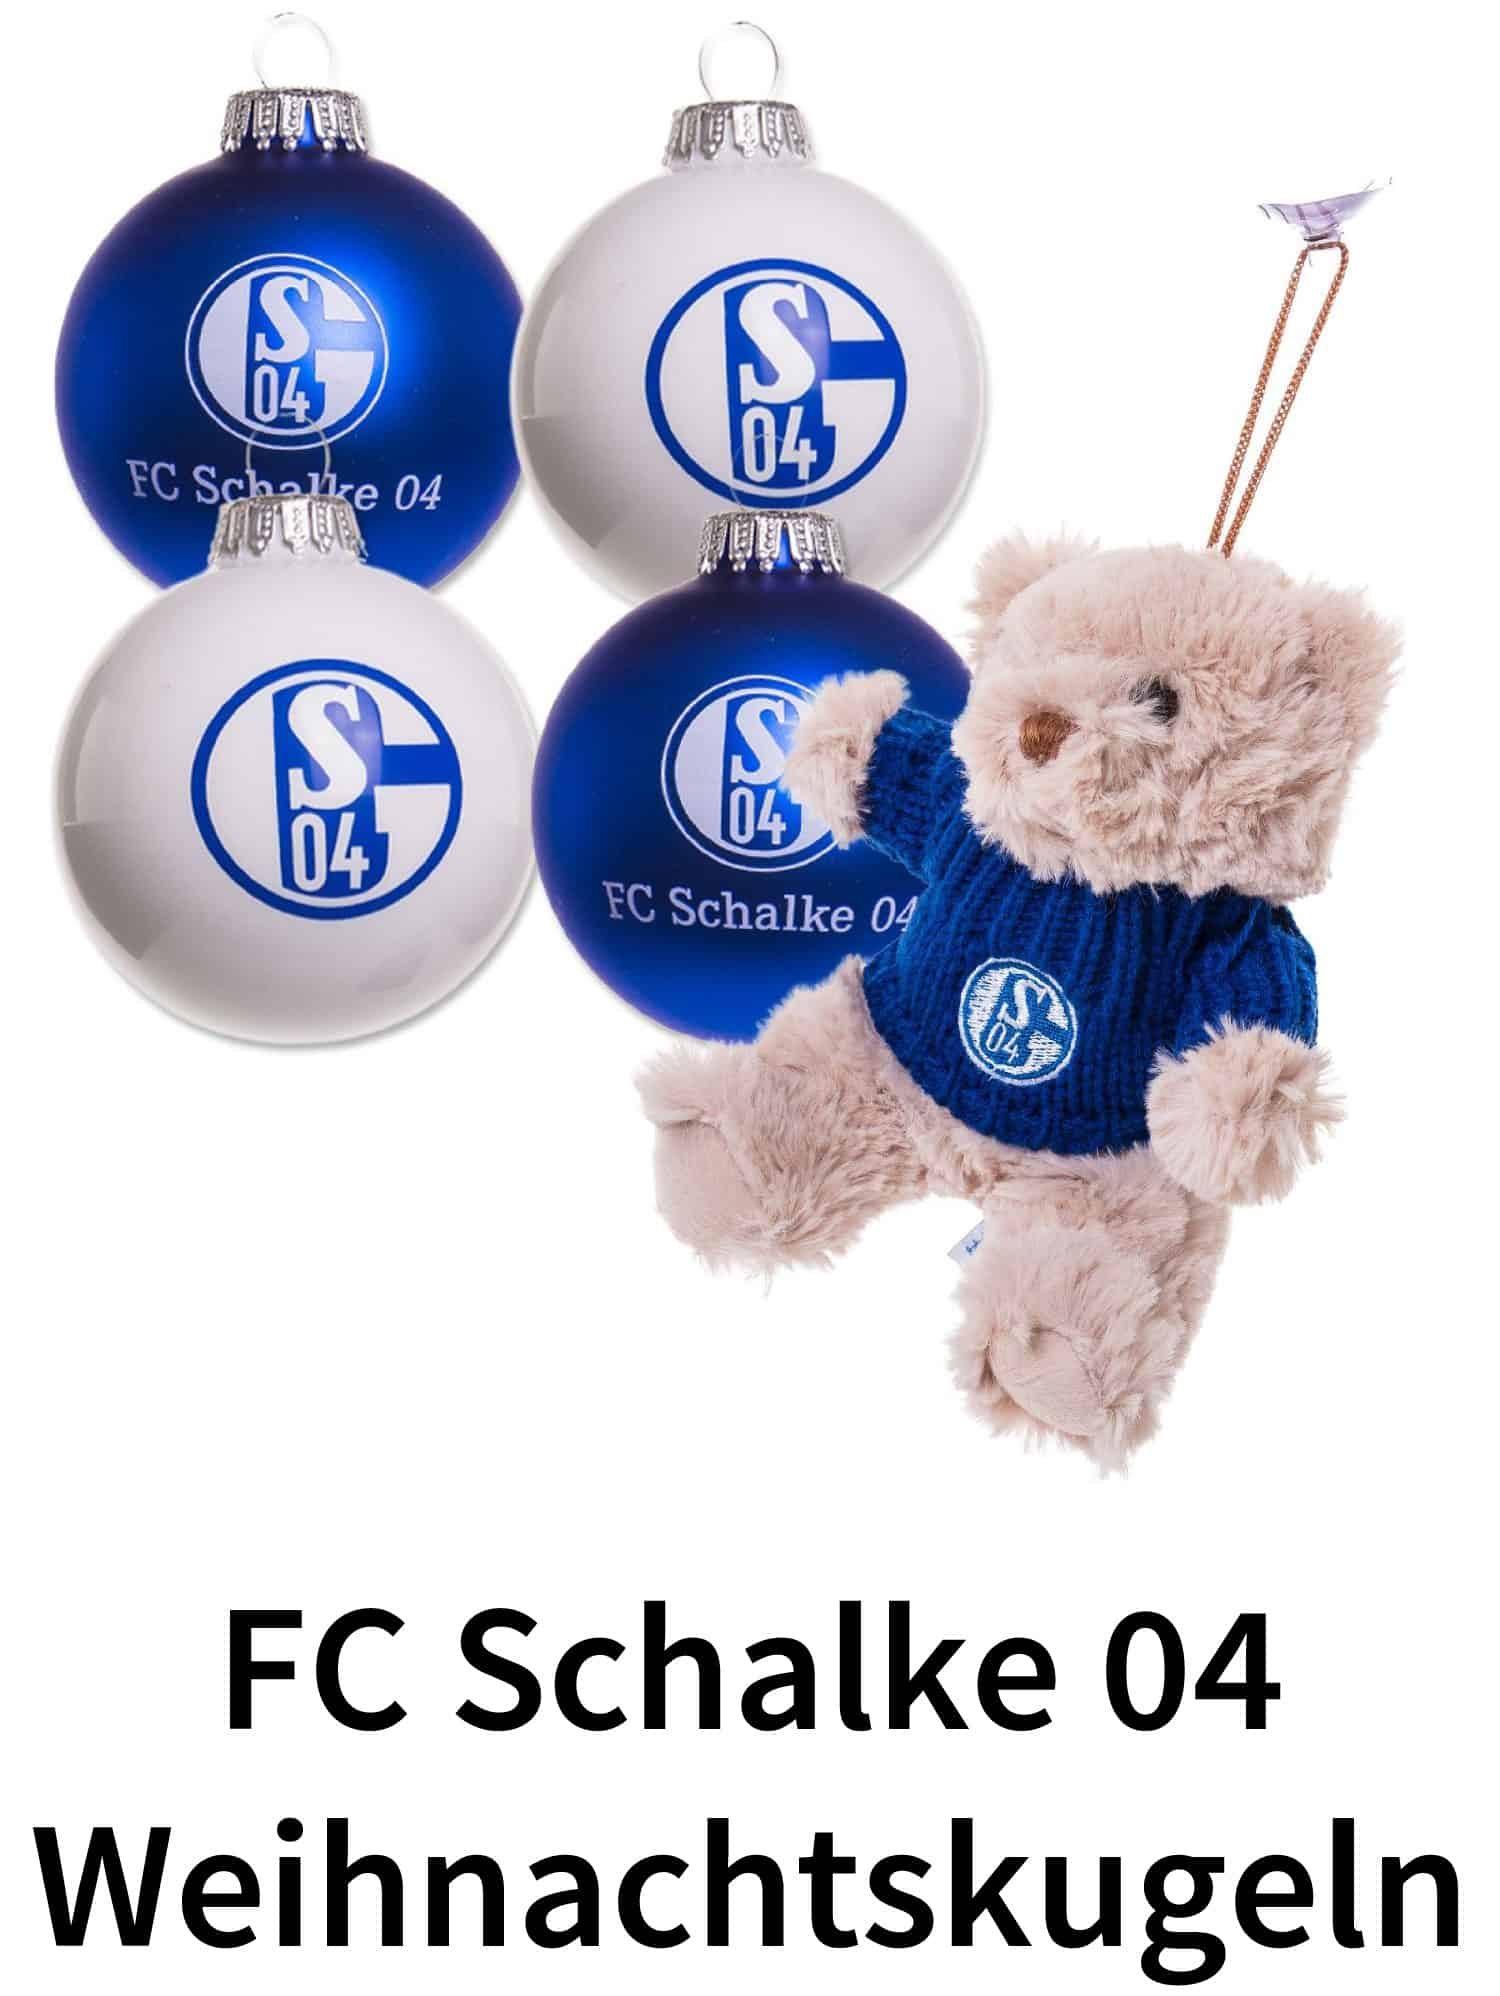 Fc schalke 04 weihnachtskugeln fu ball christbaumkugeln - Weihnachtskugeln cappuccino ...